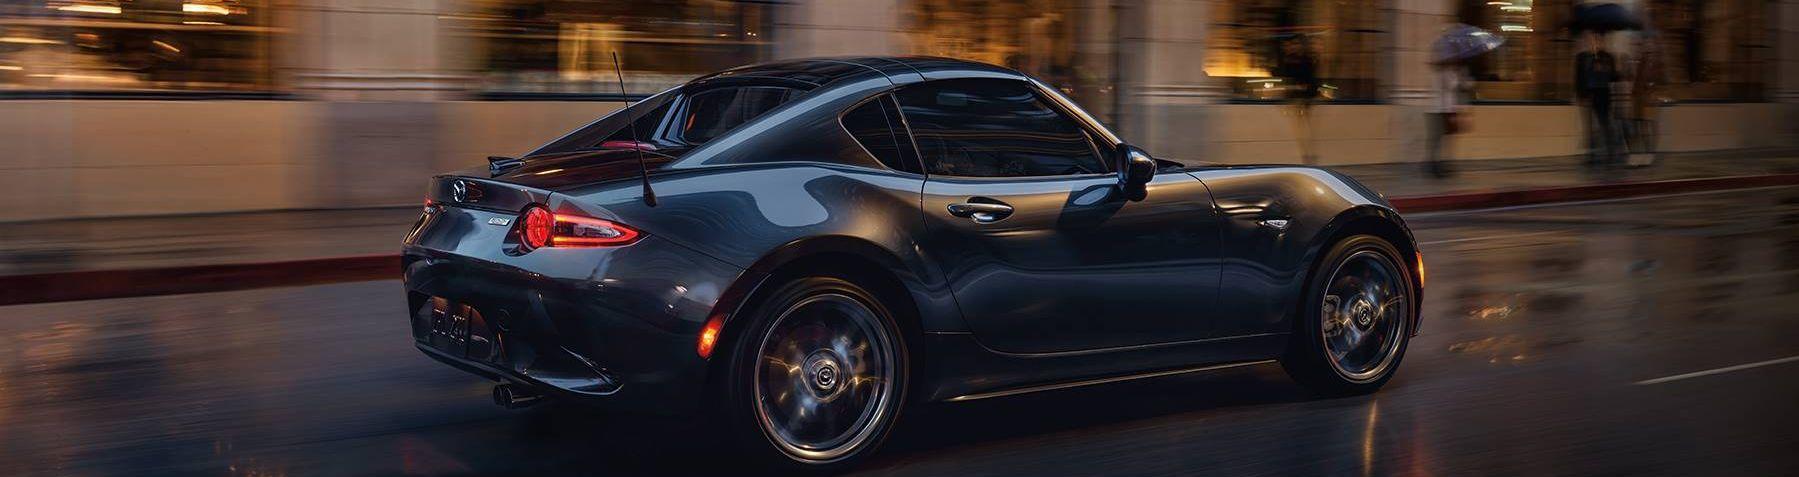 2019 Mazda MX-5 Miata RF for Sale near Killeen, TX - World